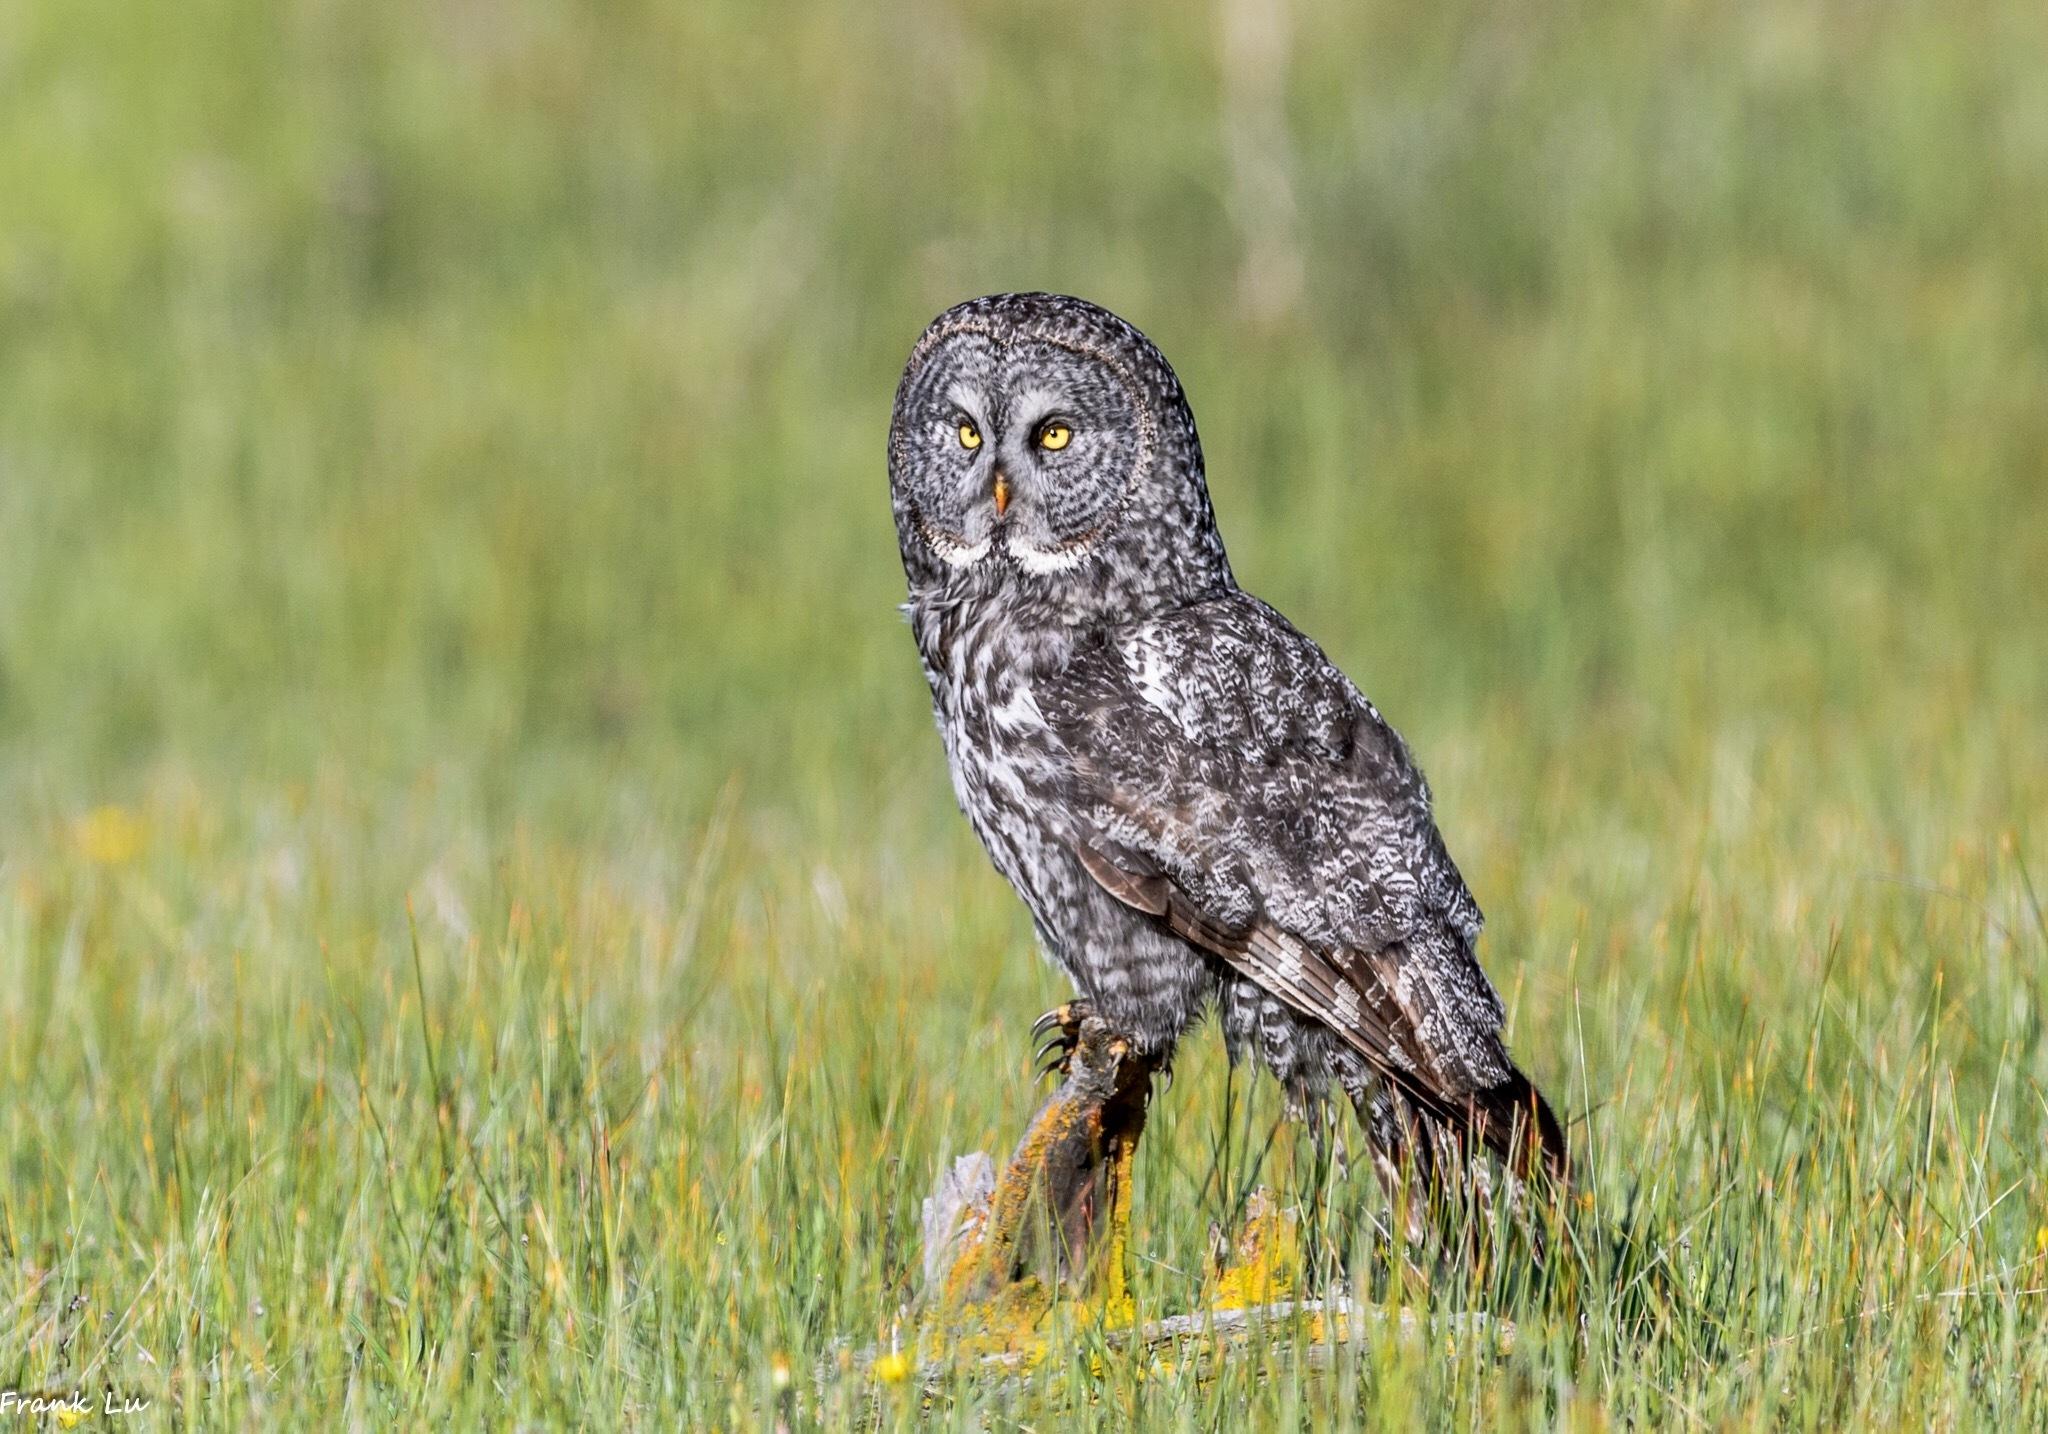 Great Gray Owl by Janmilu